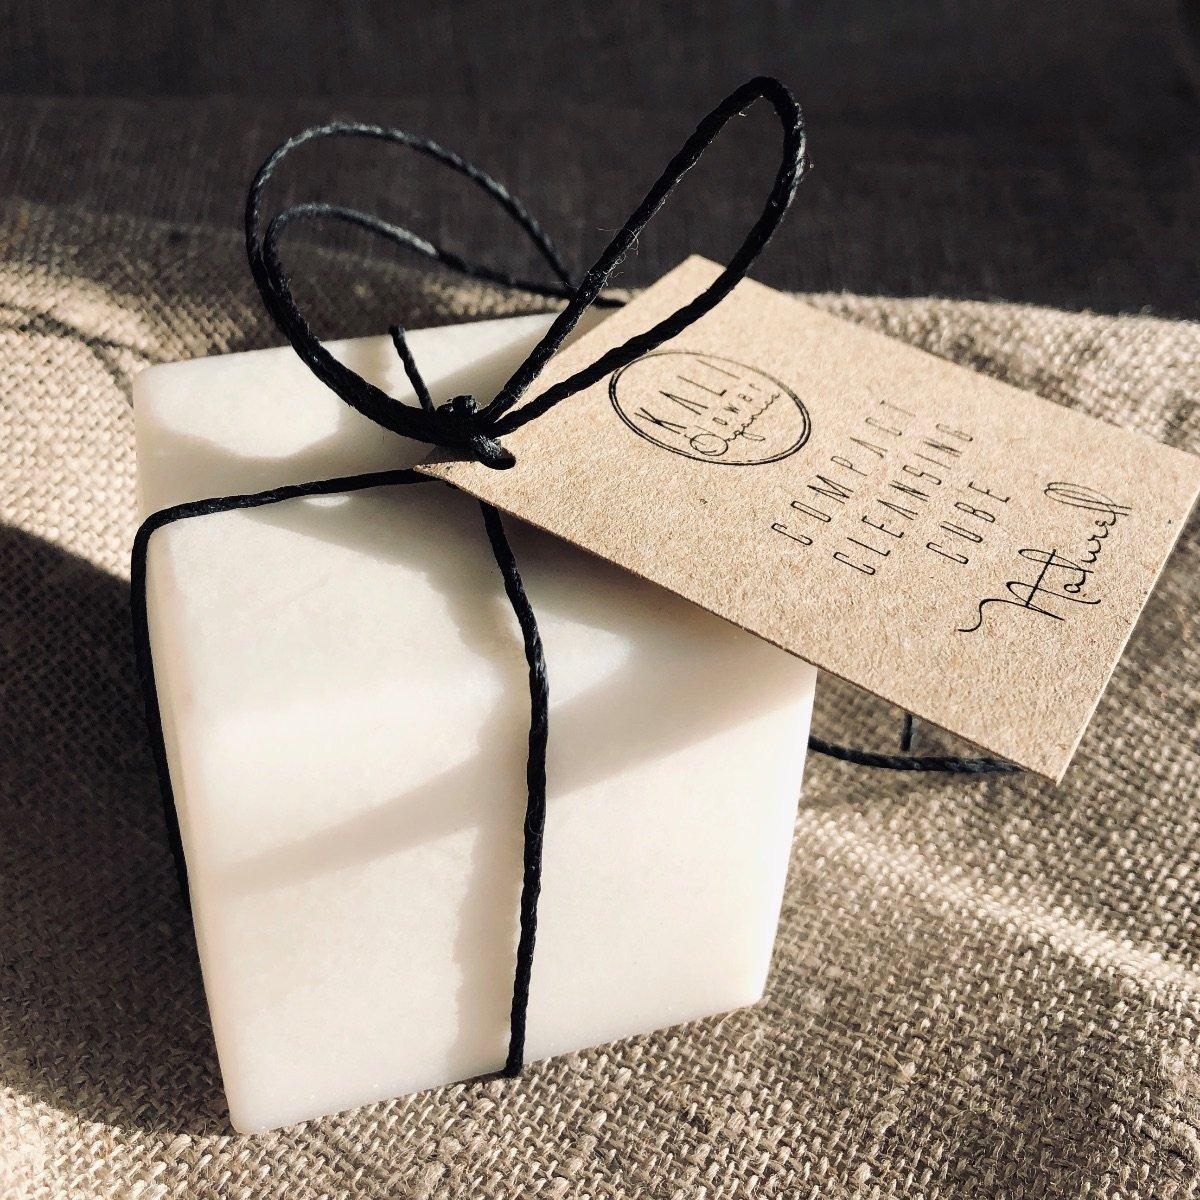 Hushållstvål Compact Cleansing Cube i fönsterljus - KaliFlower Organics